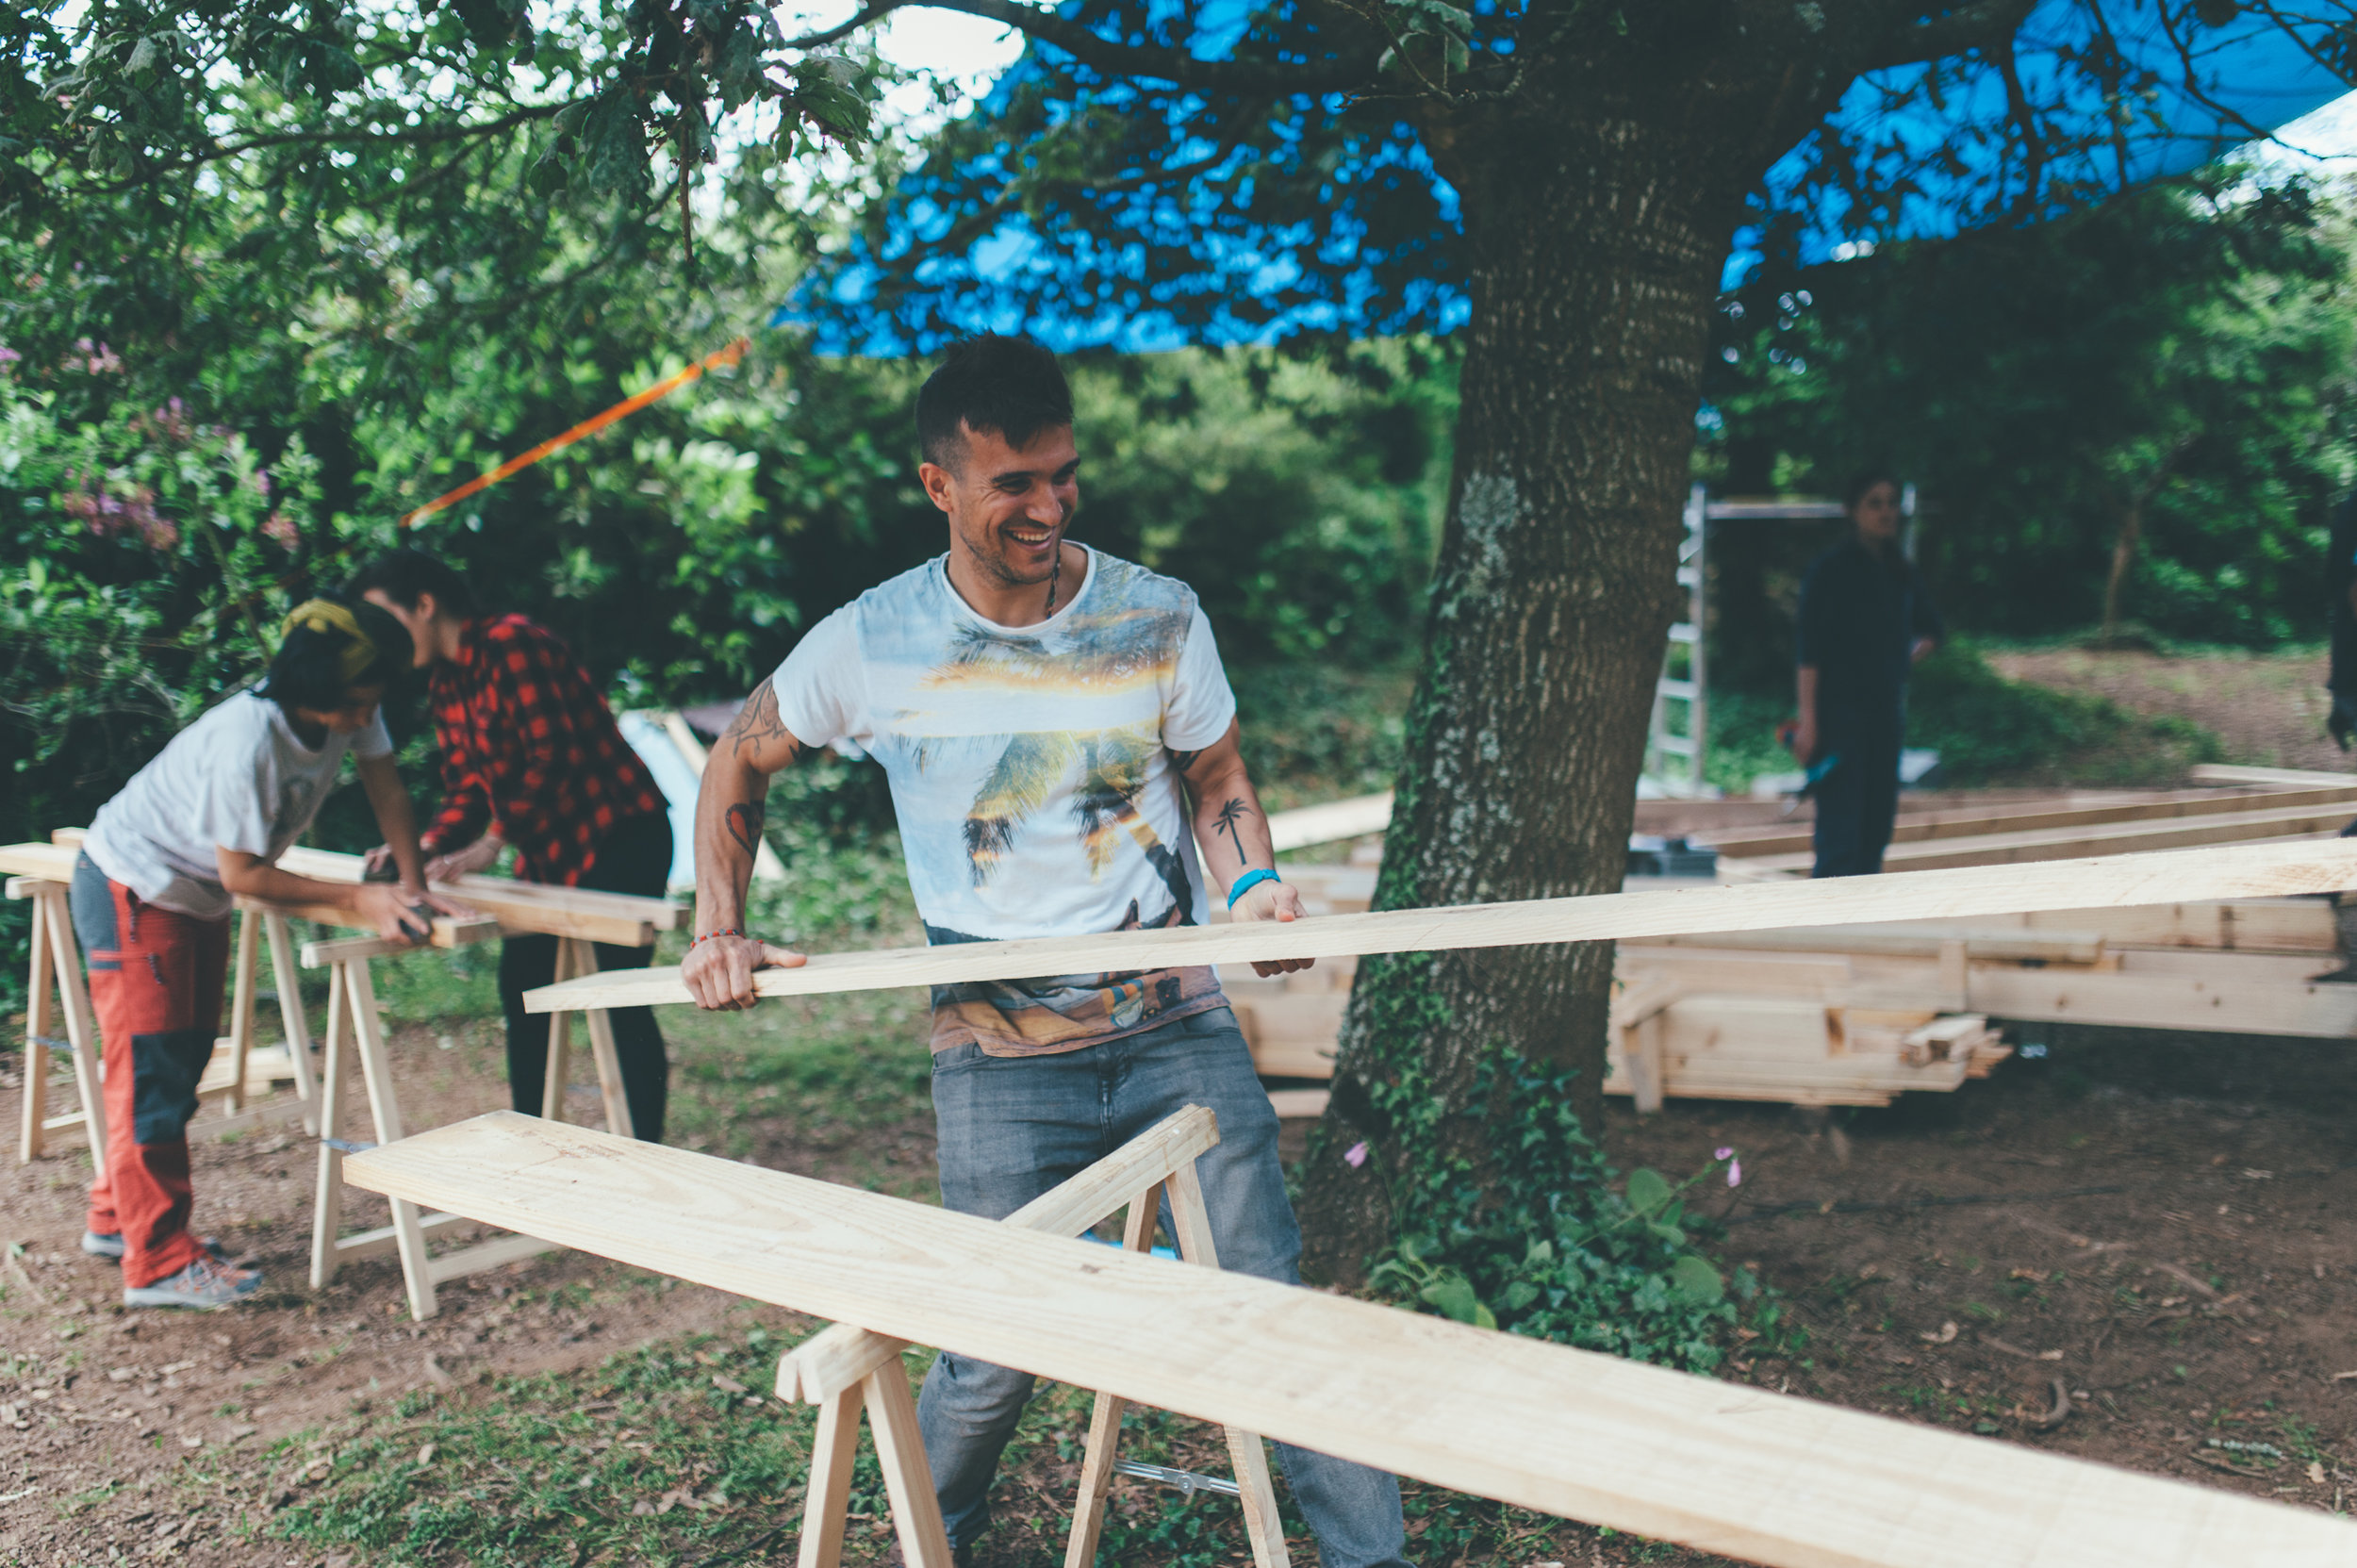 Taller de construcción de cabañas en Castelo Studio